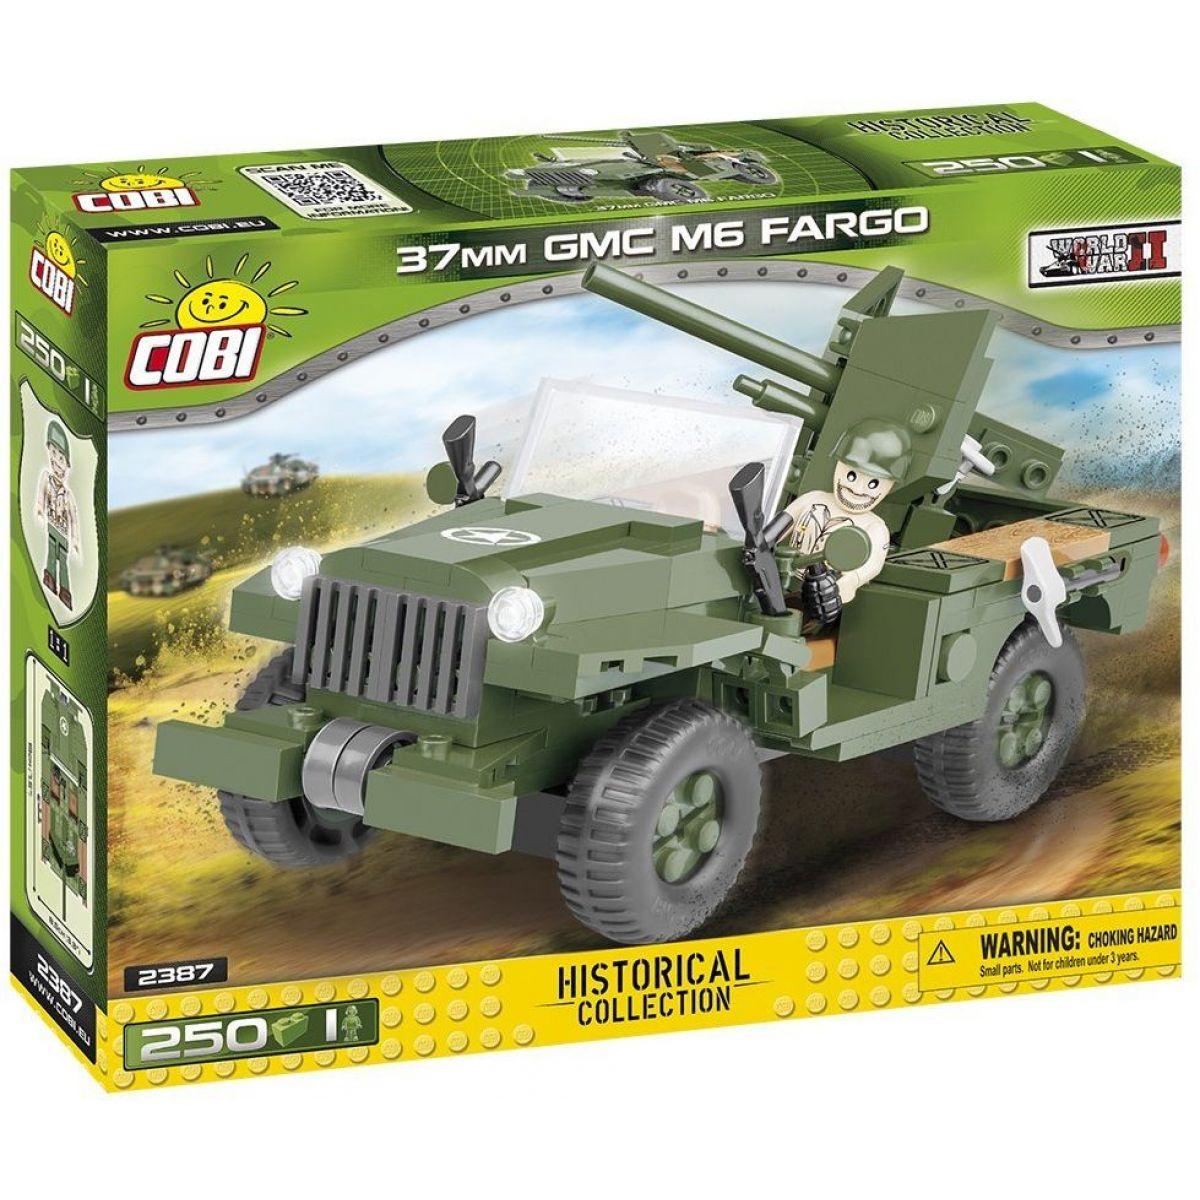 Cobi 2387 Malá armáda II. světová válka 37 Mm Gmc M6 Fargo